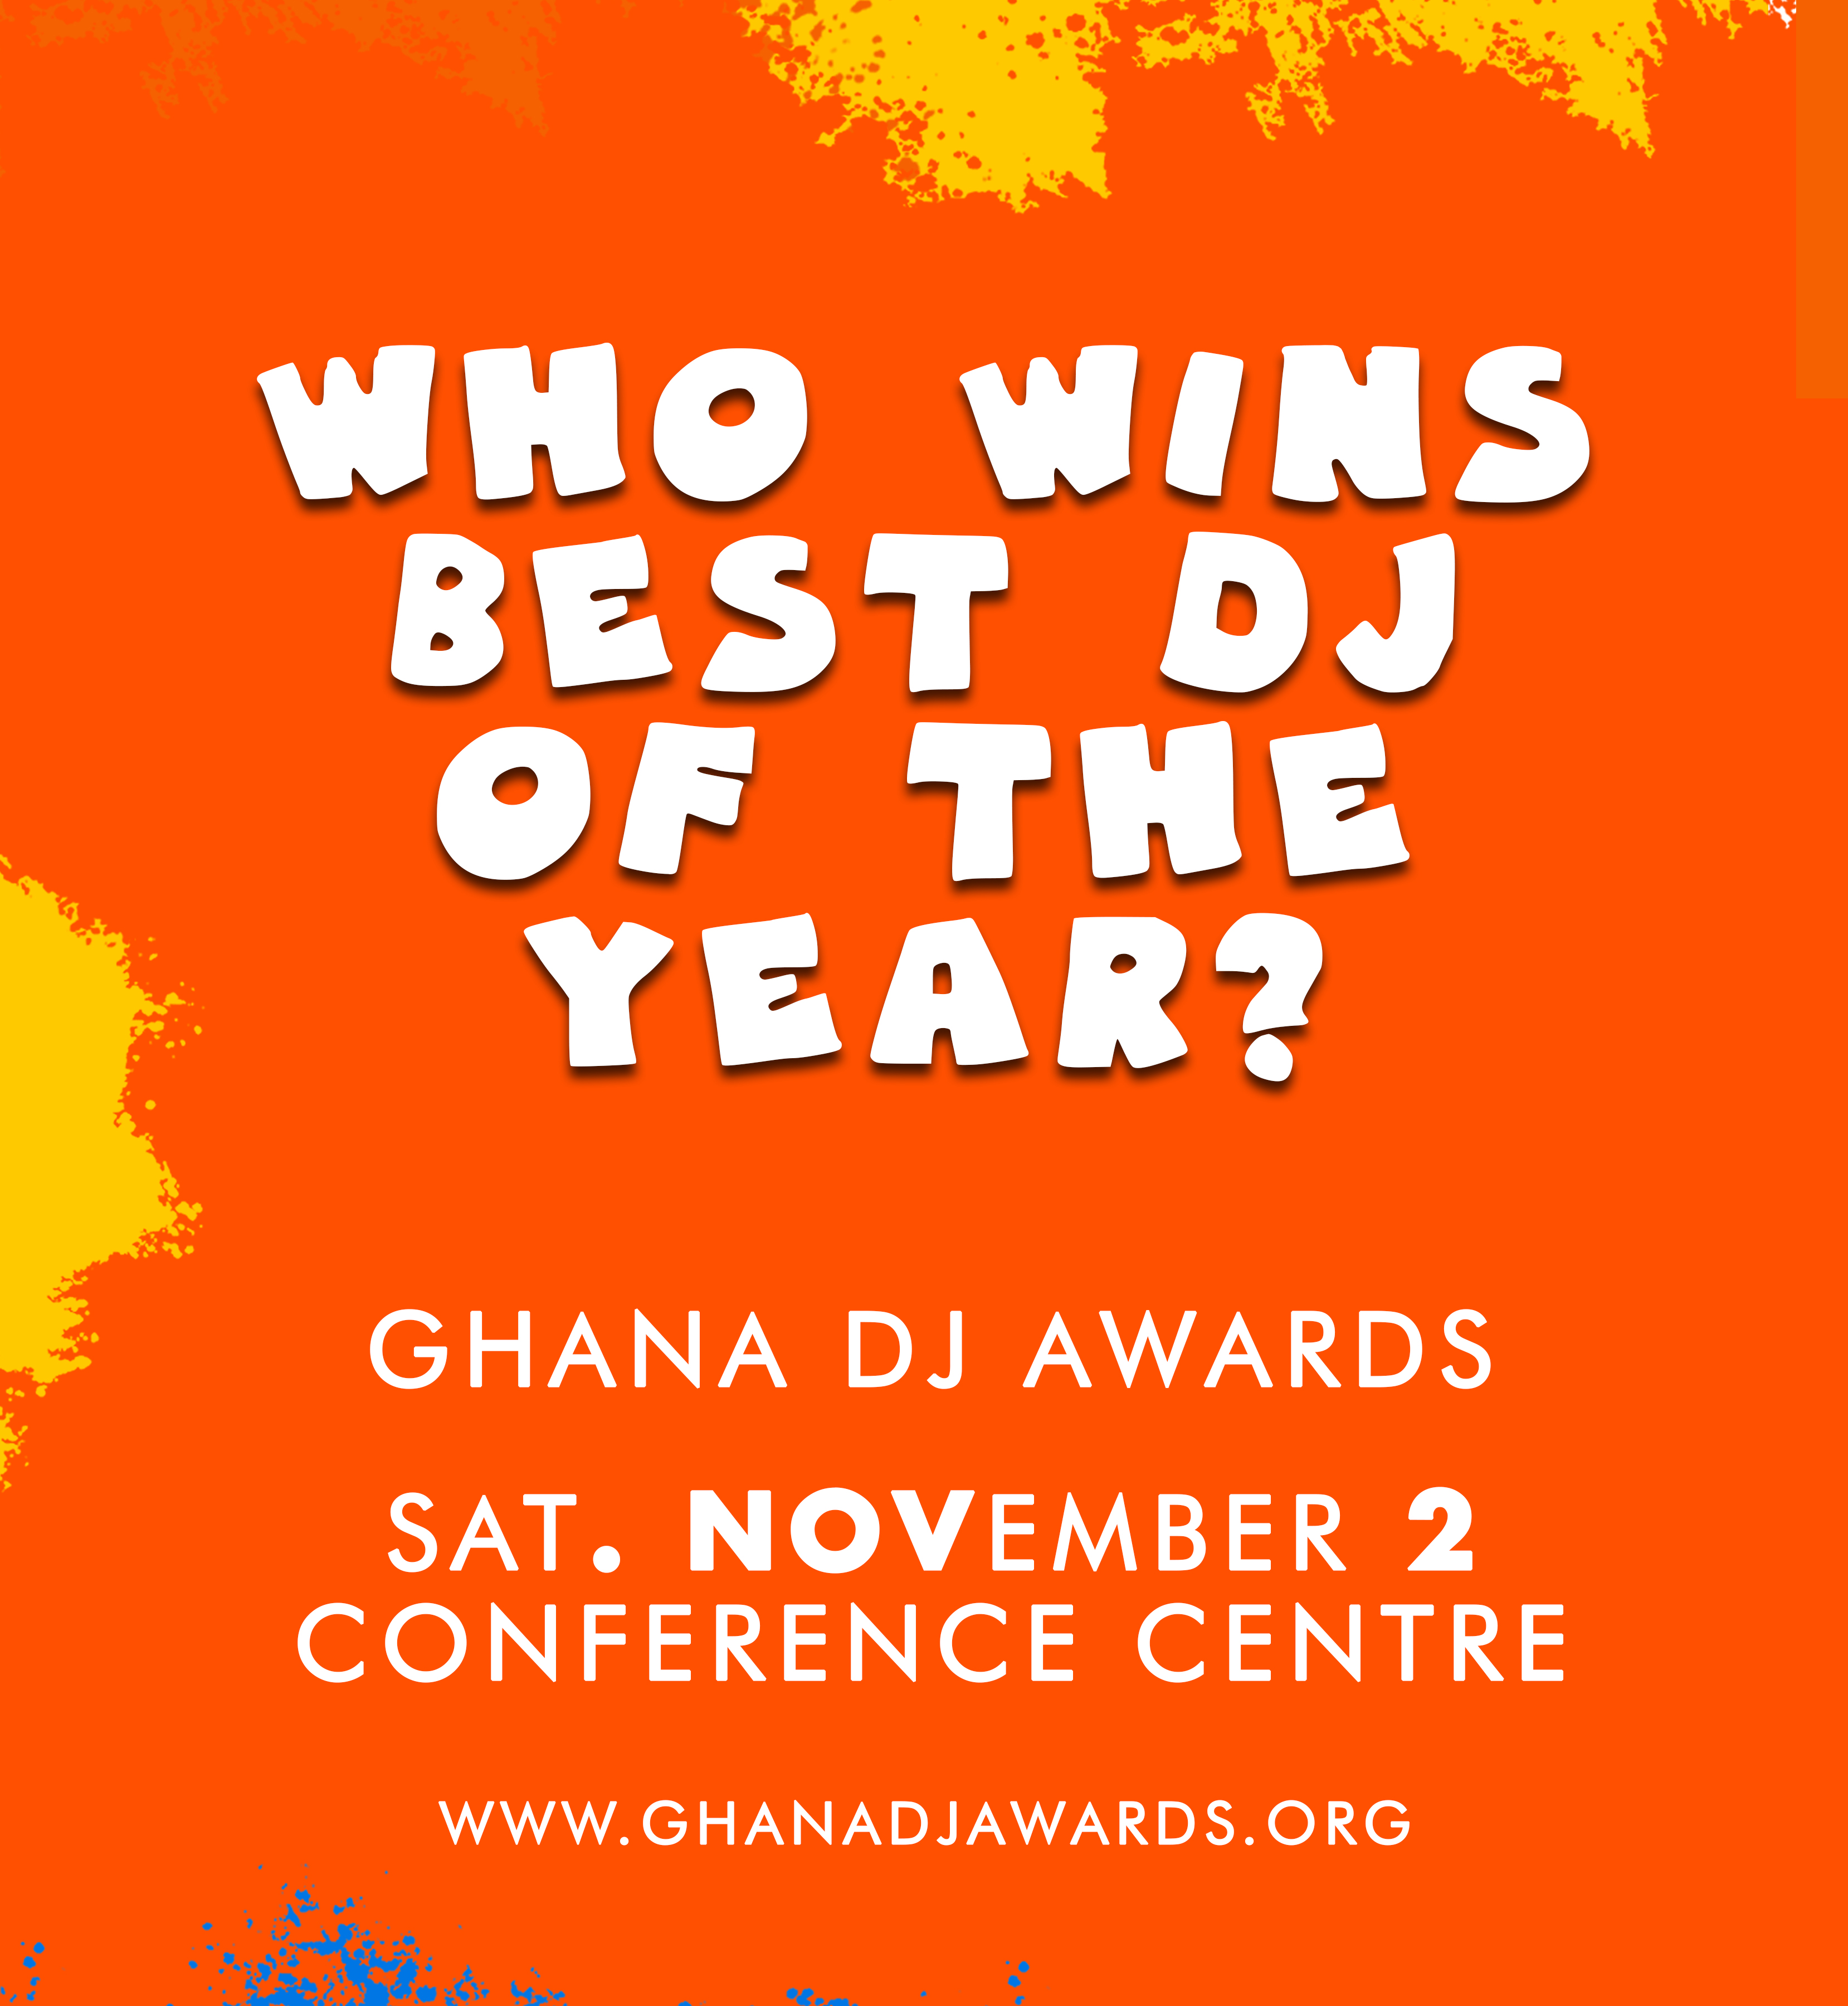 DJ SWITCH GHANA, DJ BLACK, DJ SLY, DJ AROMA, DJ VYRUSKY